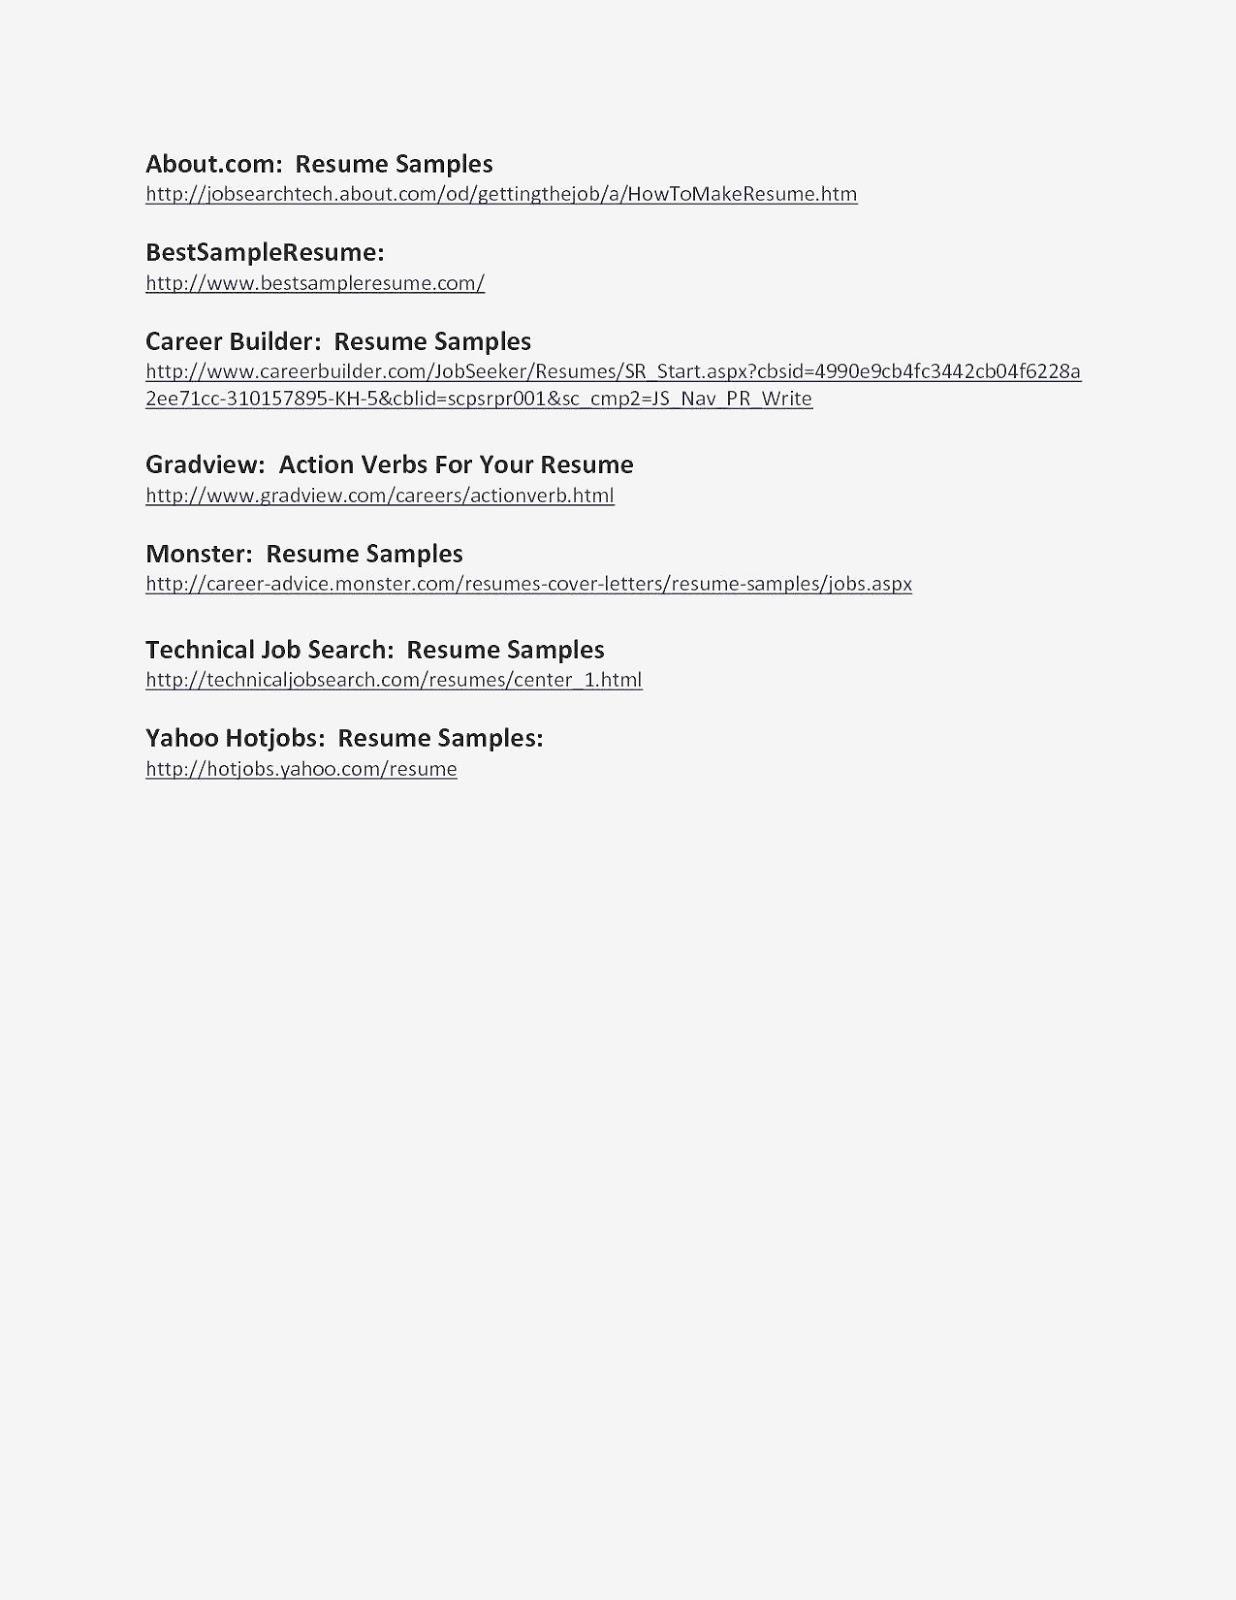 accounts payable resume example accounts payable resume examples 2018 accounts payable resume example australia account payable resume example account payable resume sample Accounts Payable Resume Example 2019 Resume Samples 2020 accounts payable resume sample india account